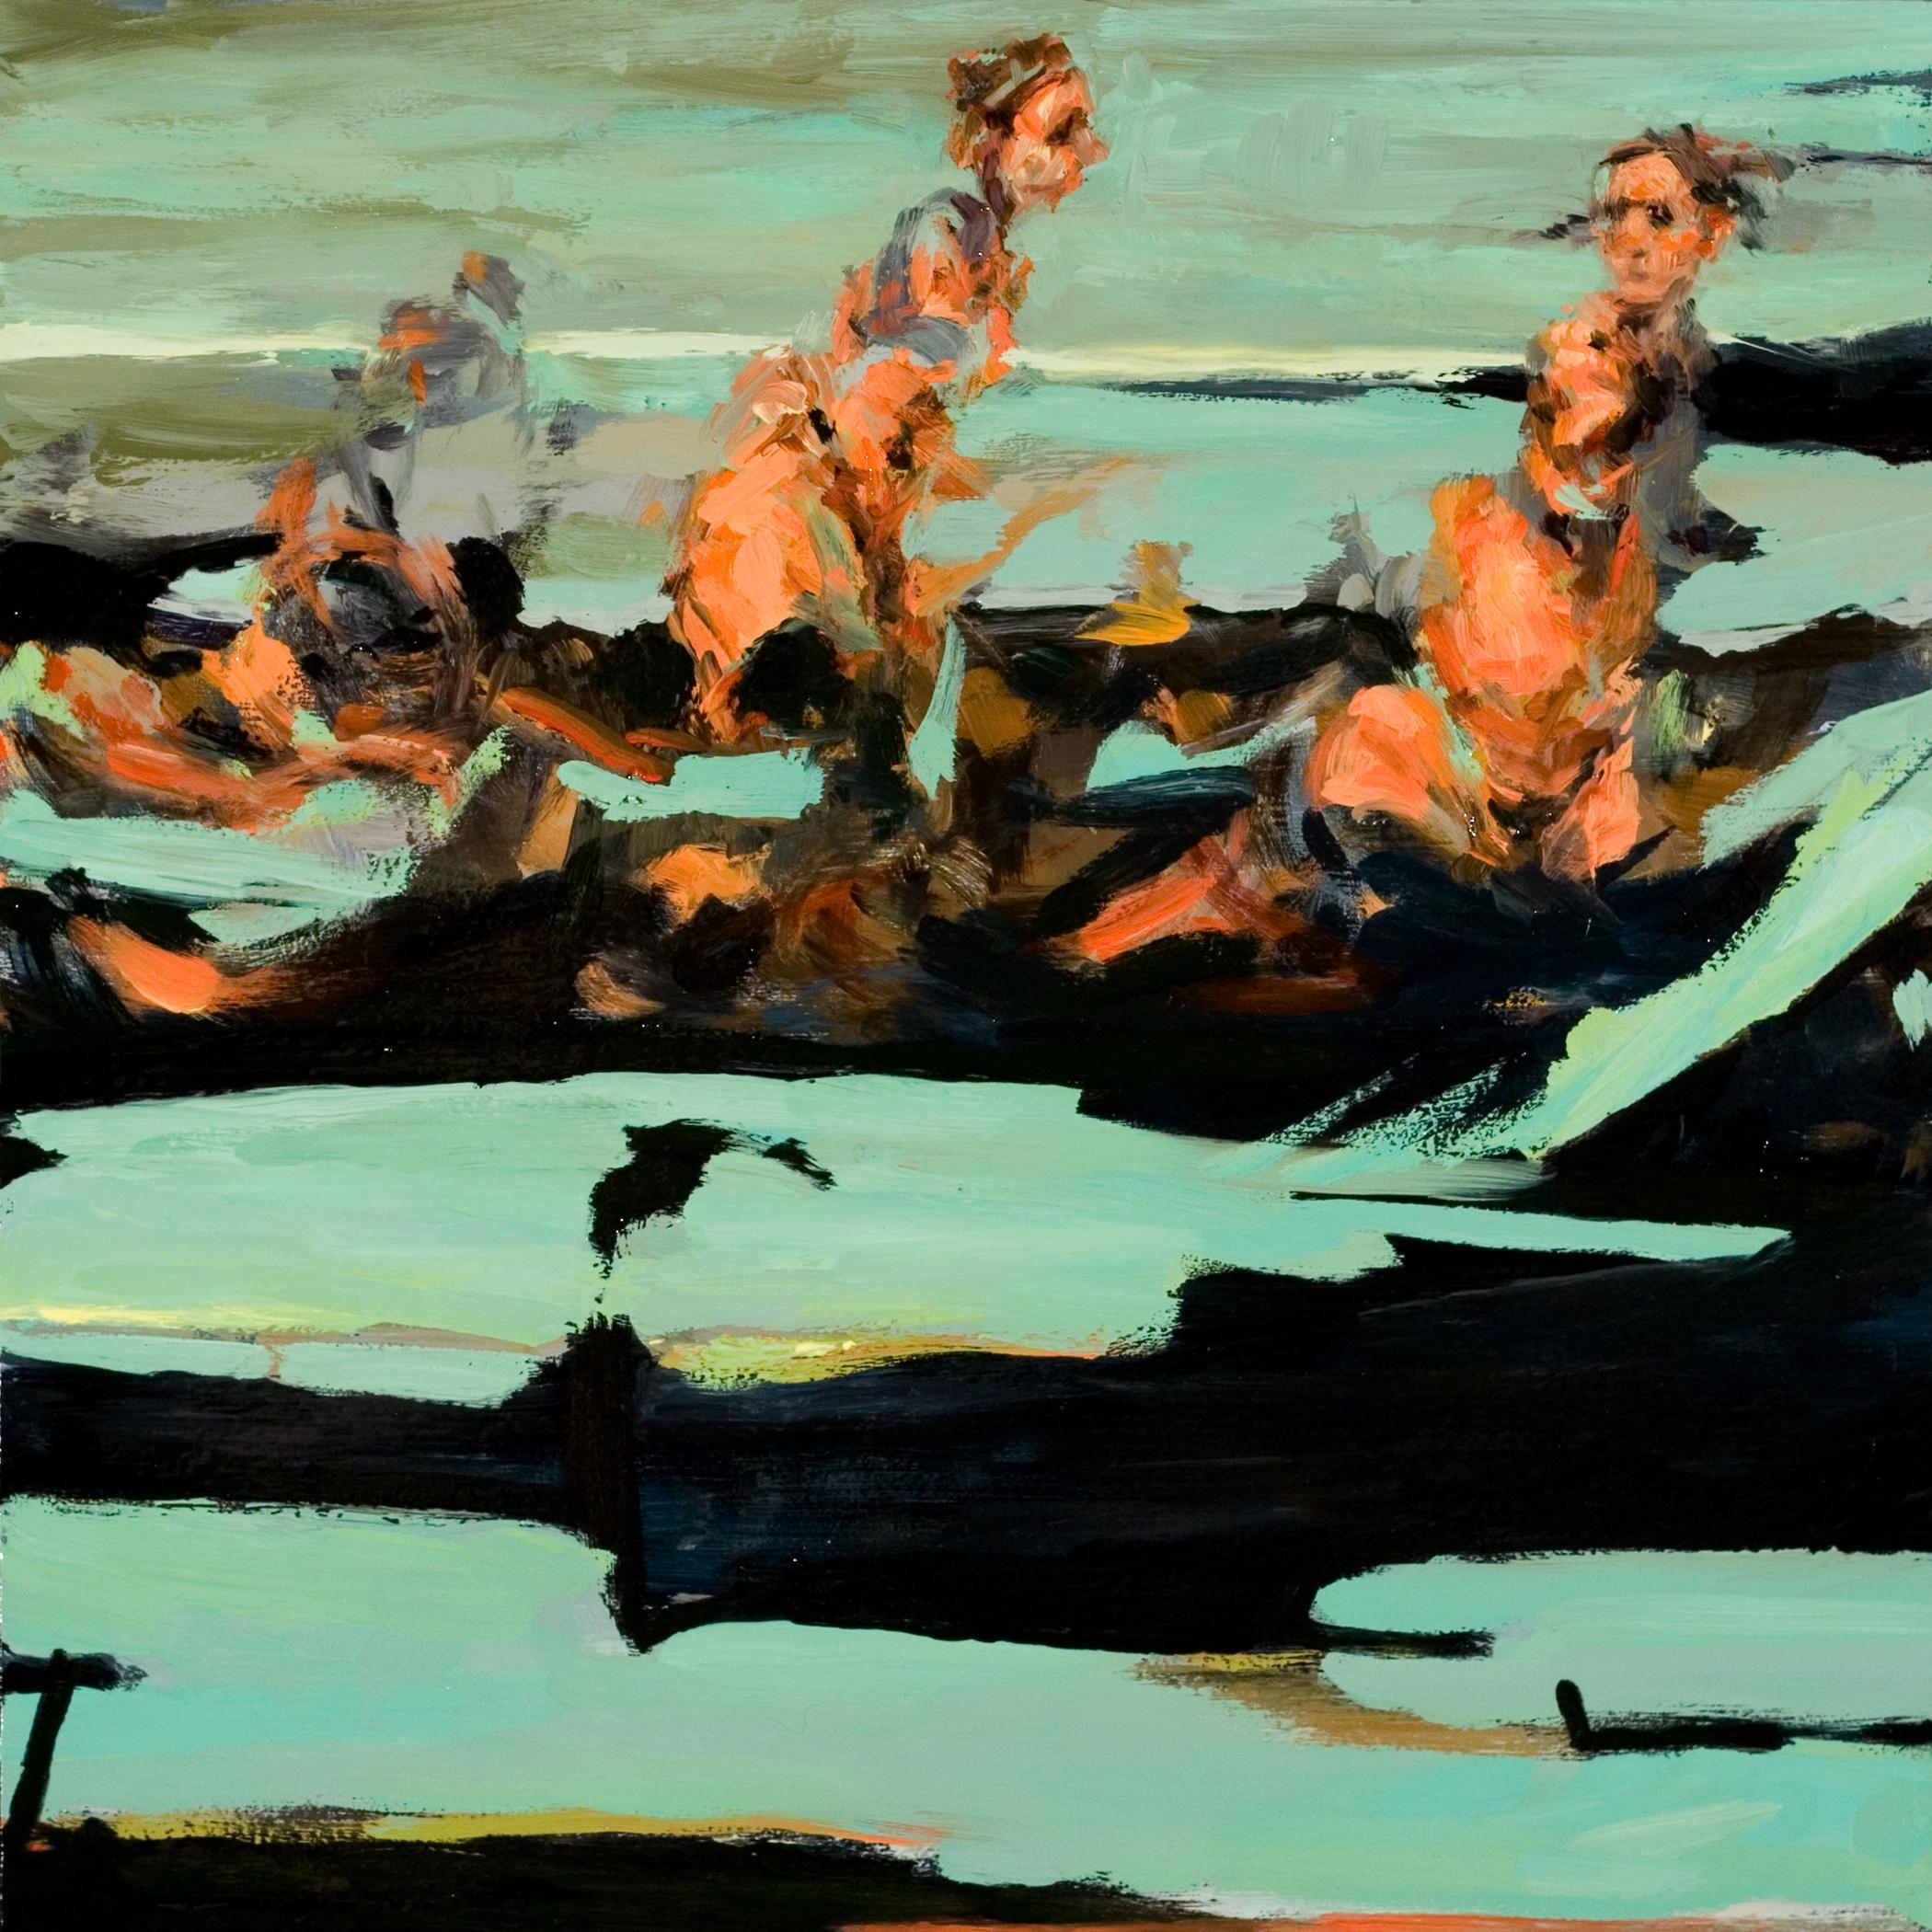 "Lost, oil on board, 12"" x 12"" x 2"", 2009"